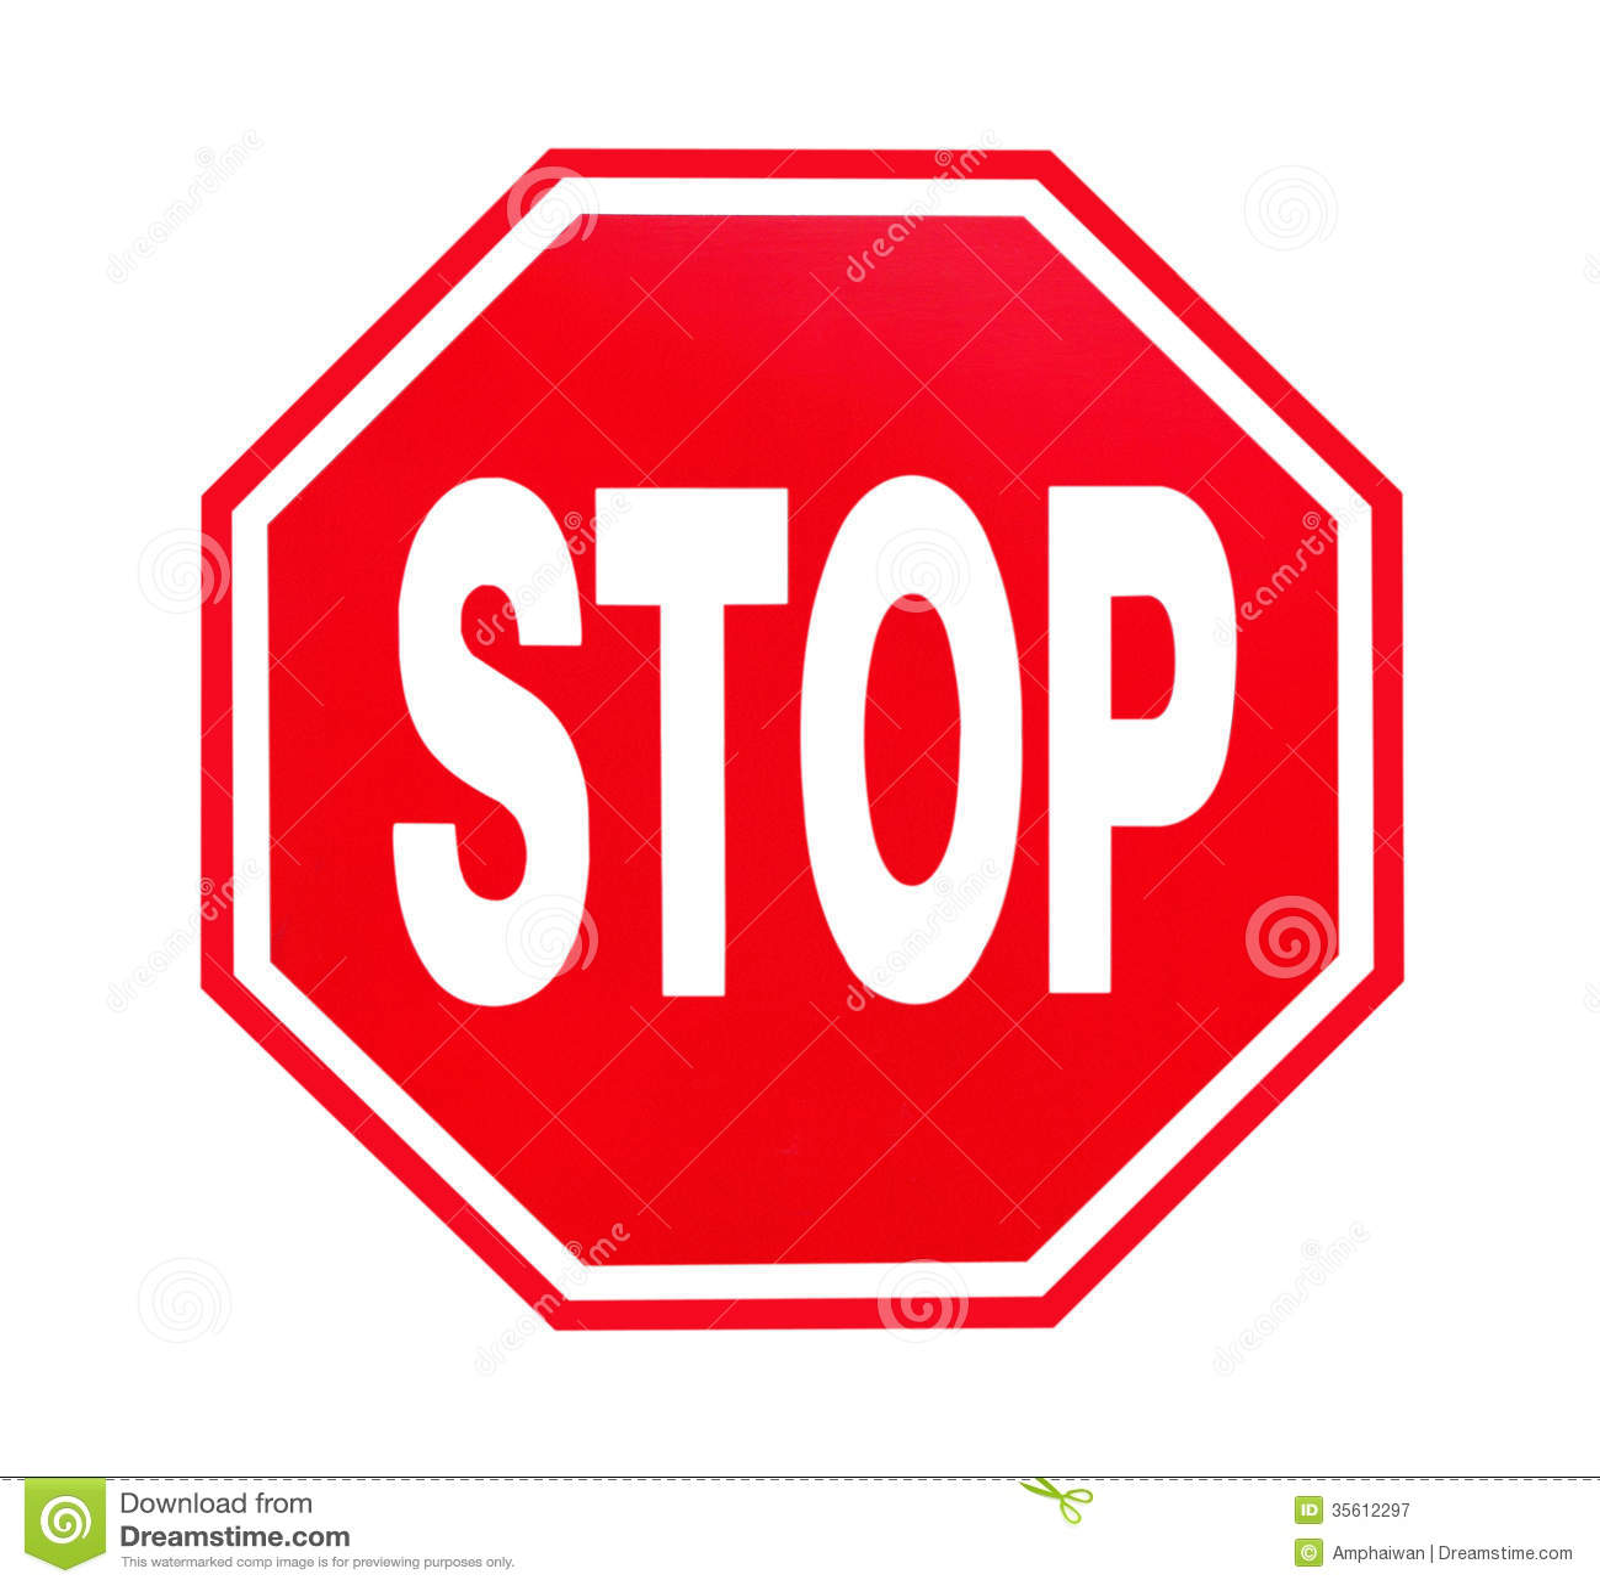 Stoppschild Lizenzfreie Stockfotografie - Bild: 35612297